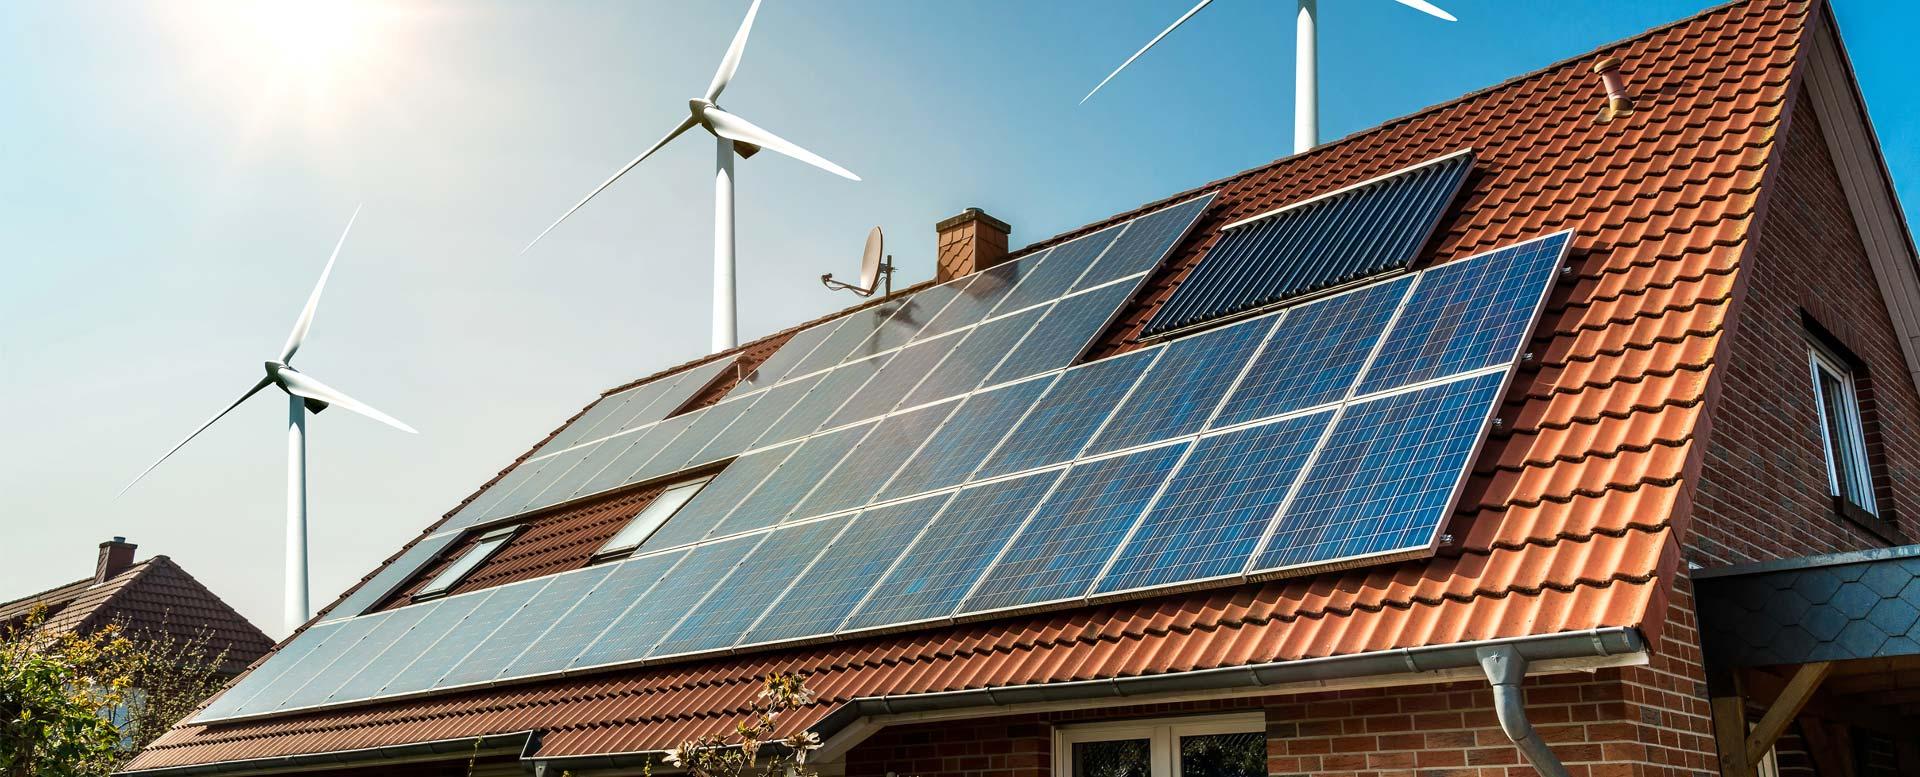 Photovoltaik-Anlage mit Solarthermie